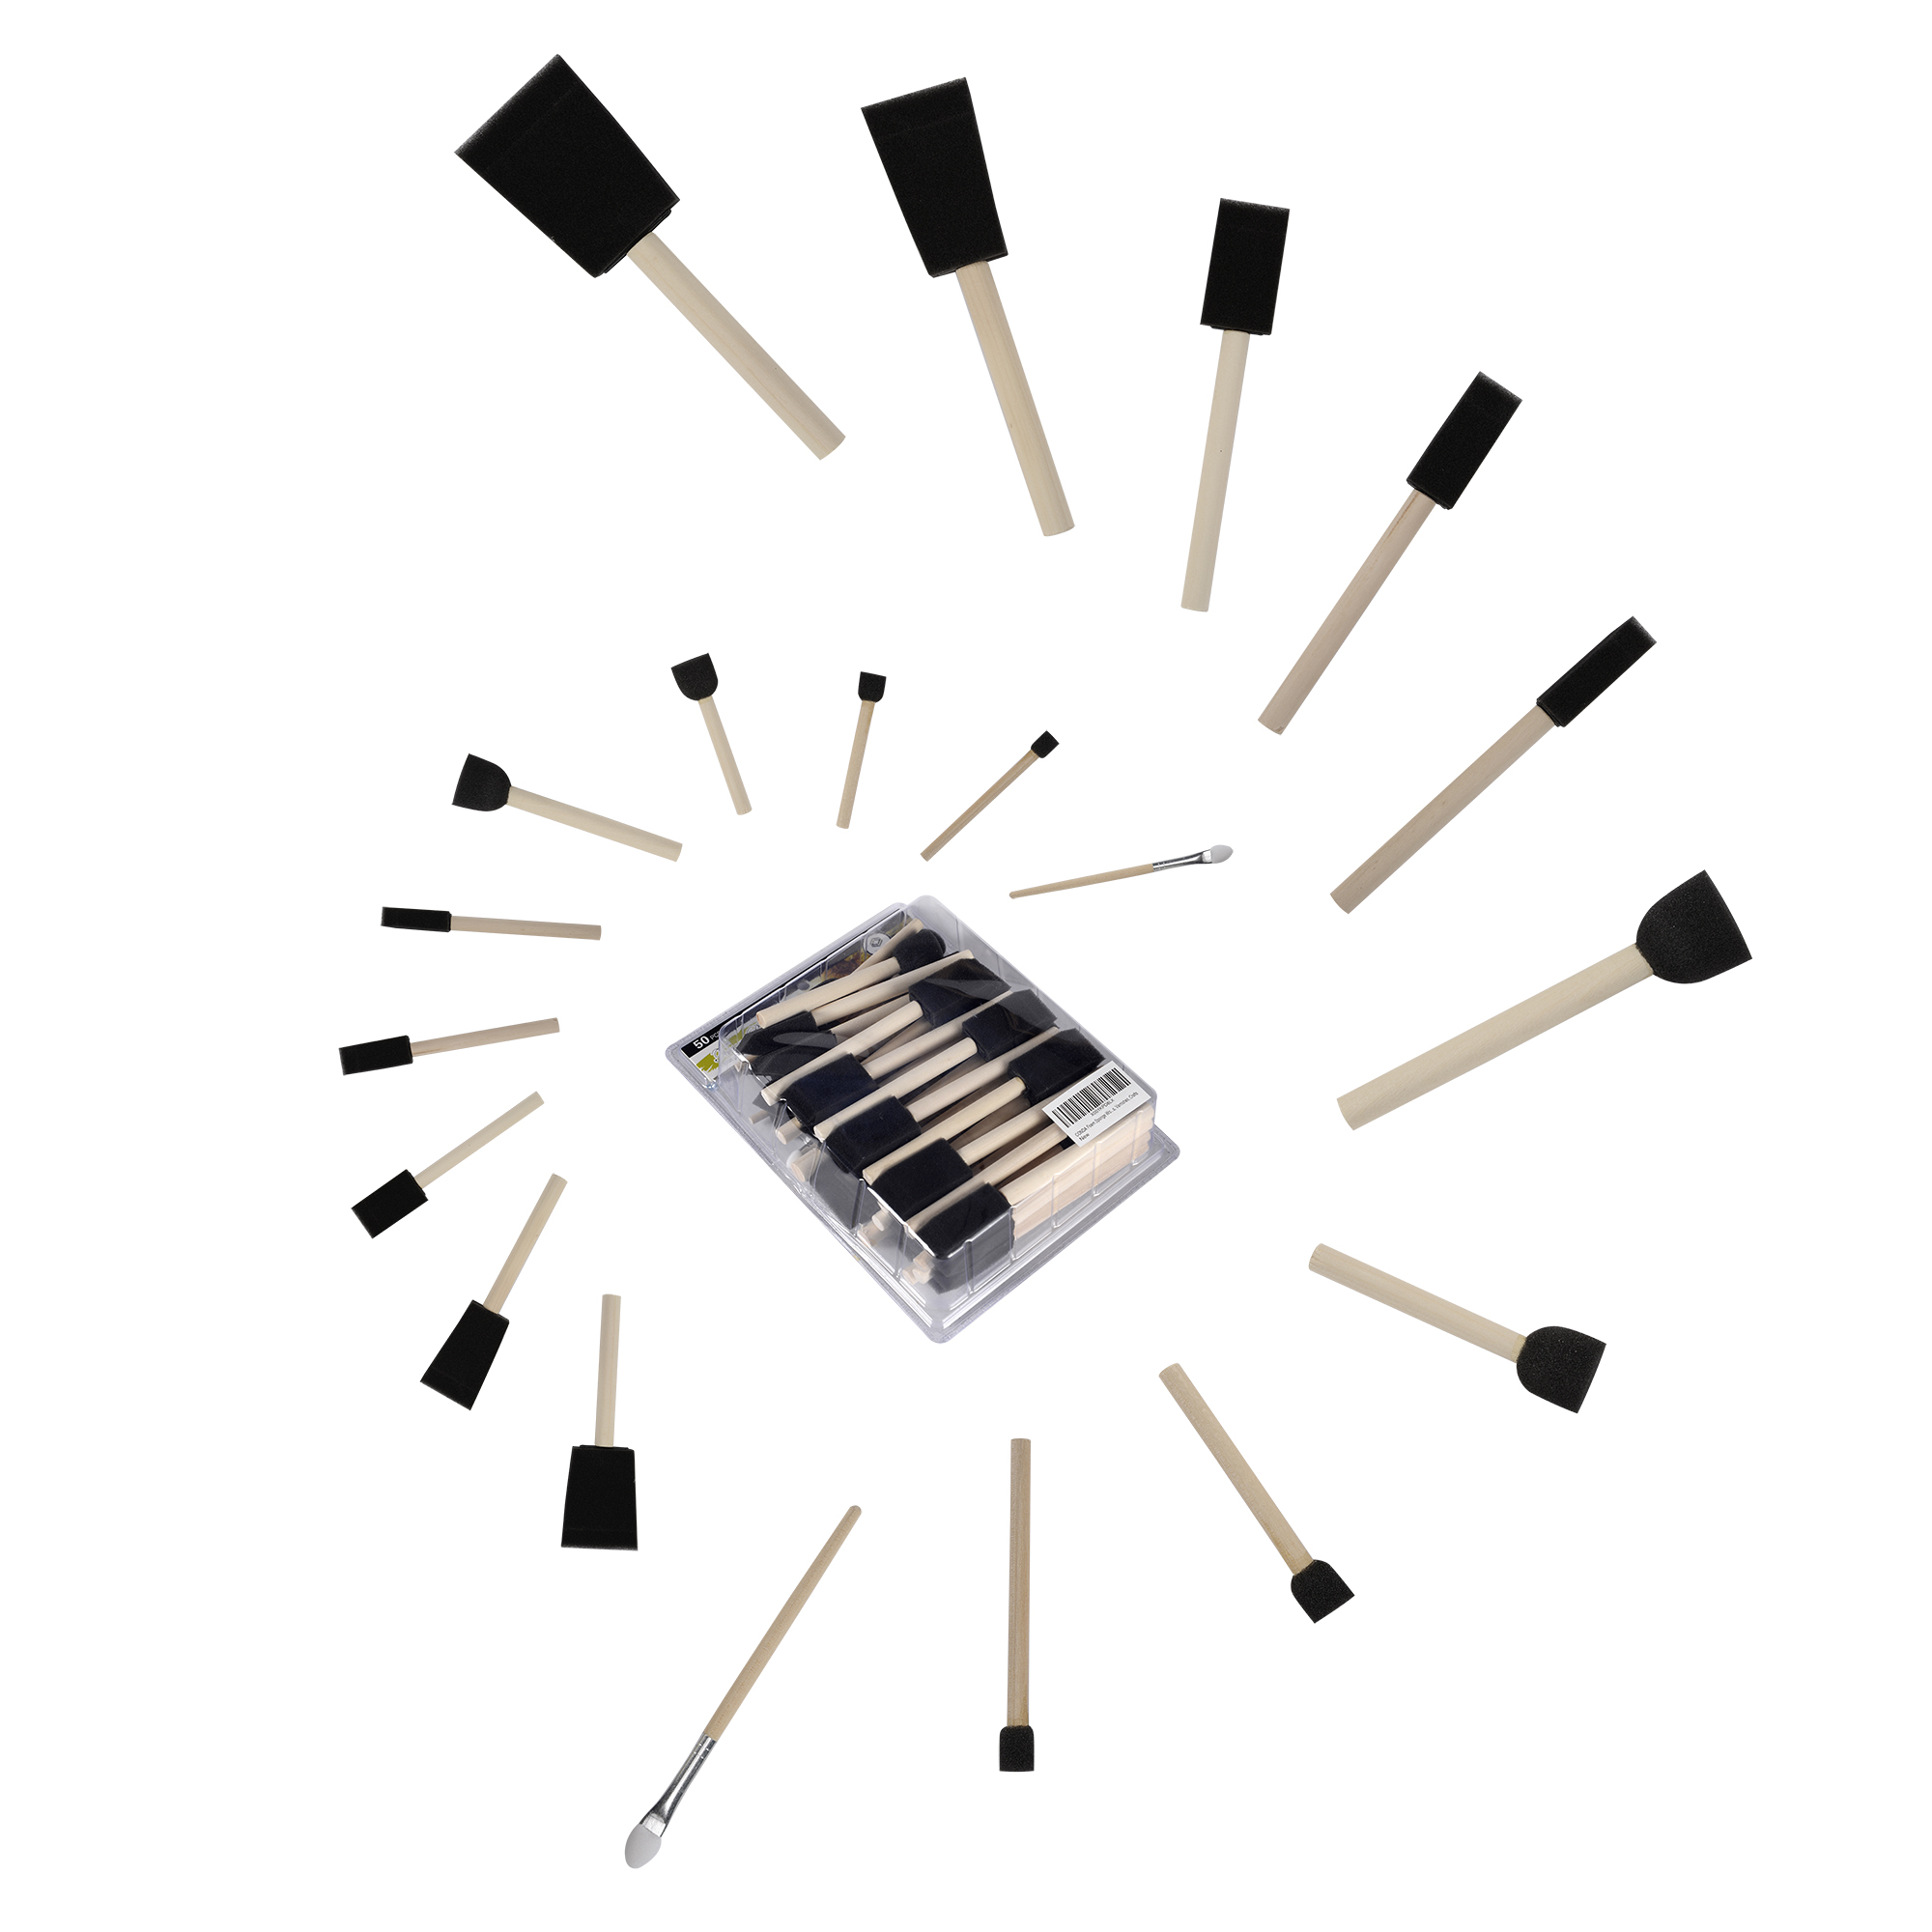 Foam Brush Set Conda 50Pcs/set DIY Graffiti Sponge Art Supplies Brushes Seal Painting Tools Funny Creative Toy for Funny DrawingFoam Brush Set Conda 50Pcs/set DIY Graffiti Sponge Art Supplies Brushes Seal Painting Tools Funny Creative Toy for Funny Drawing